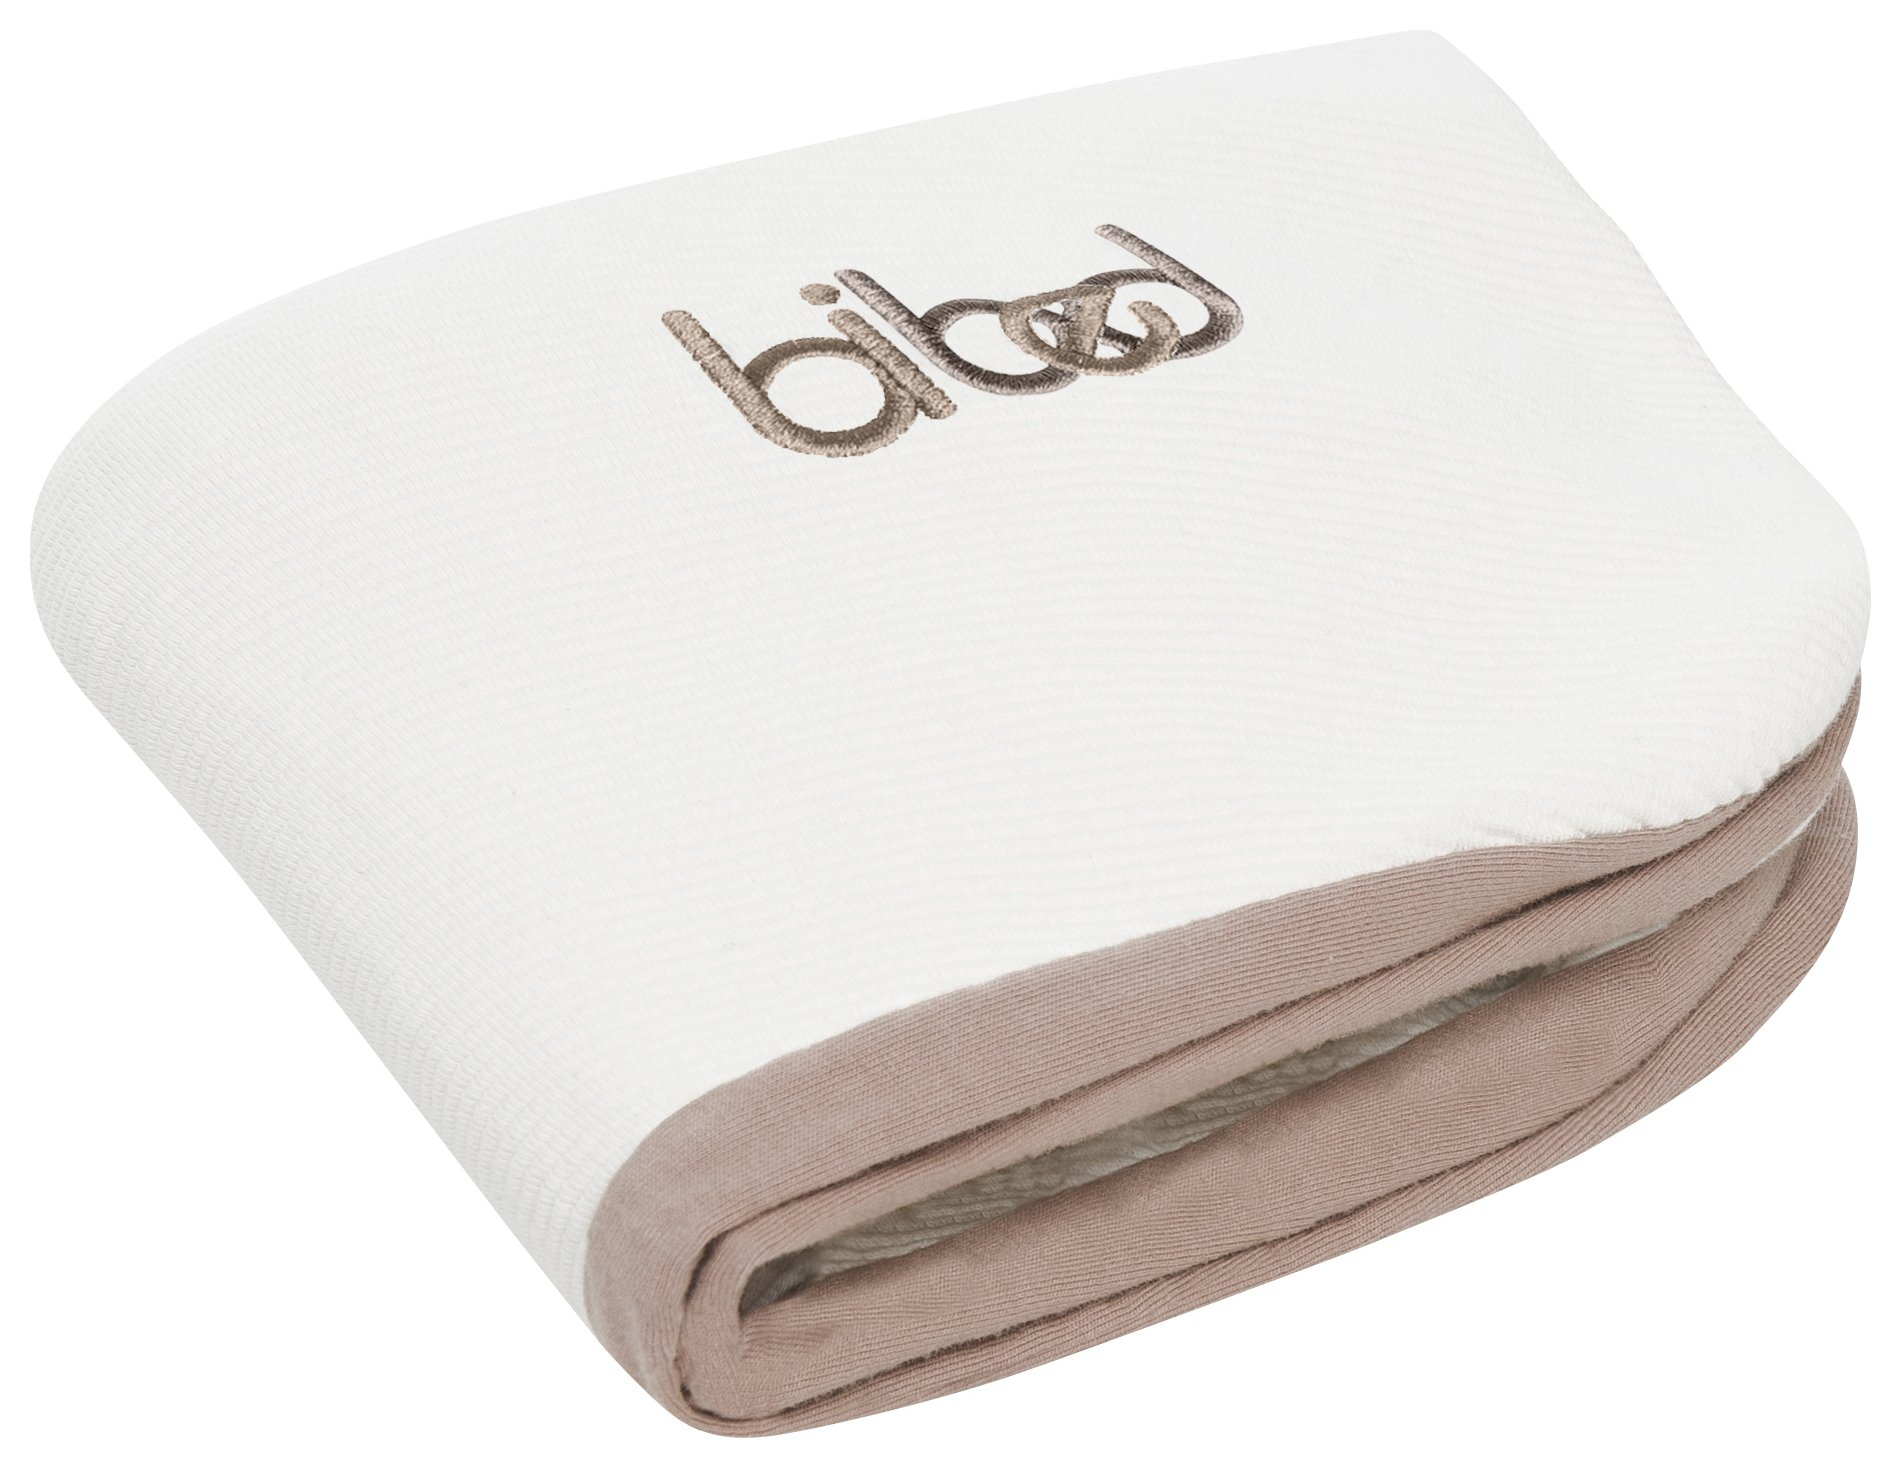 Babymoov Bibed Cover